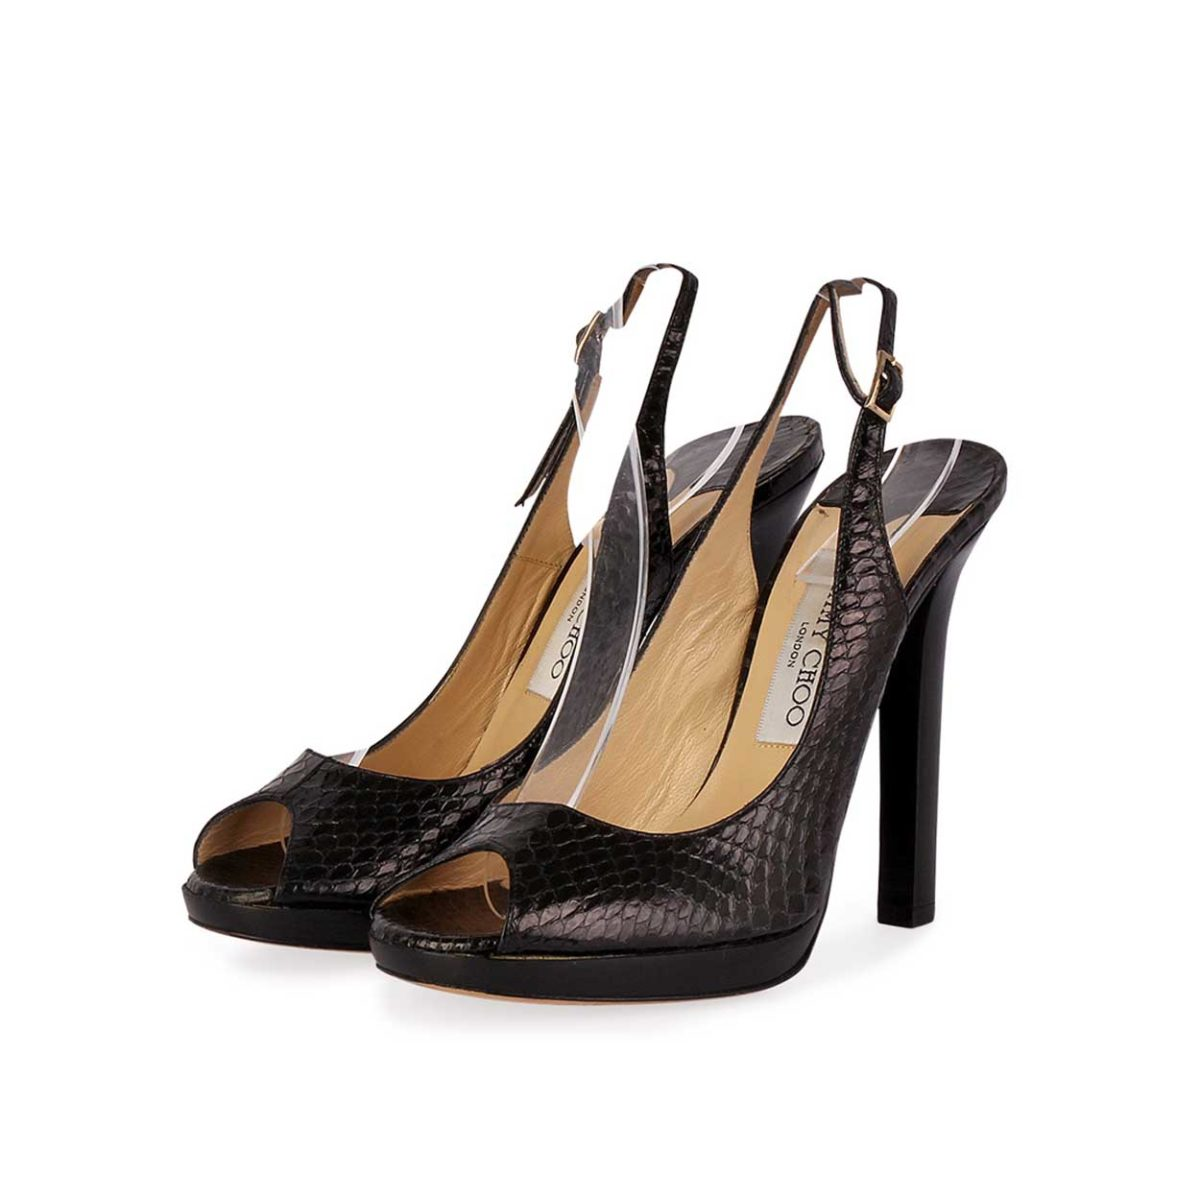 0c07c5be8954 JIMMY CHOO Snakeskin Print Peep Toe Slingback Sandals Black - 37.5 ...